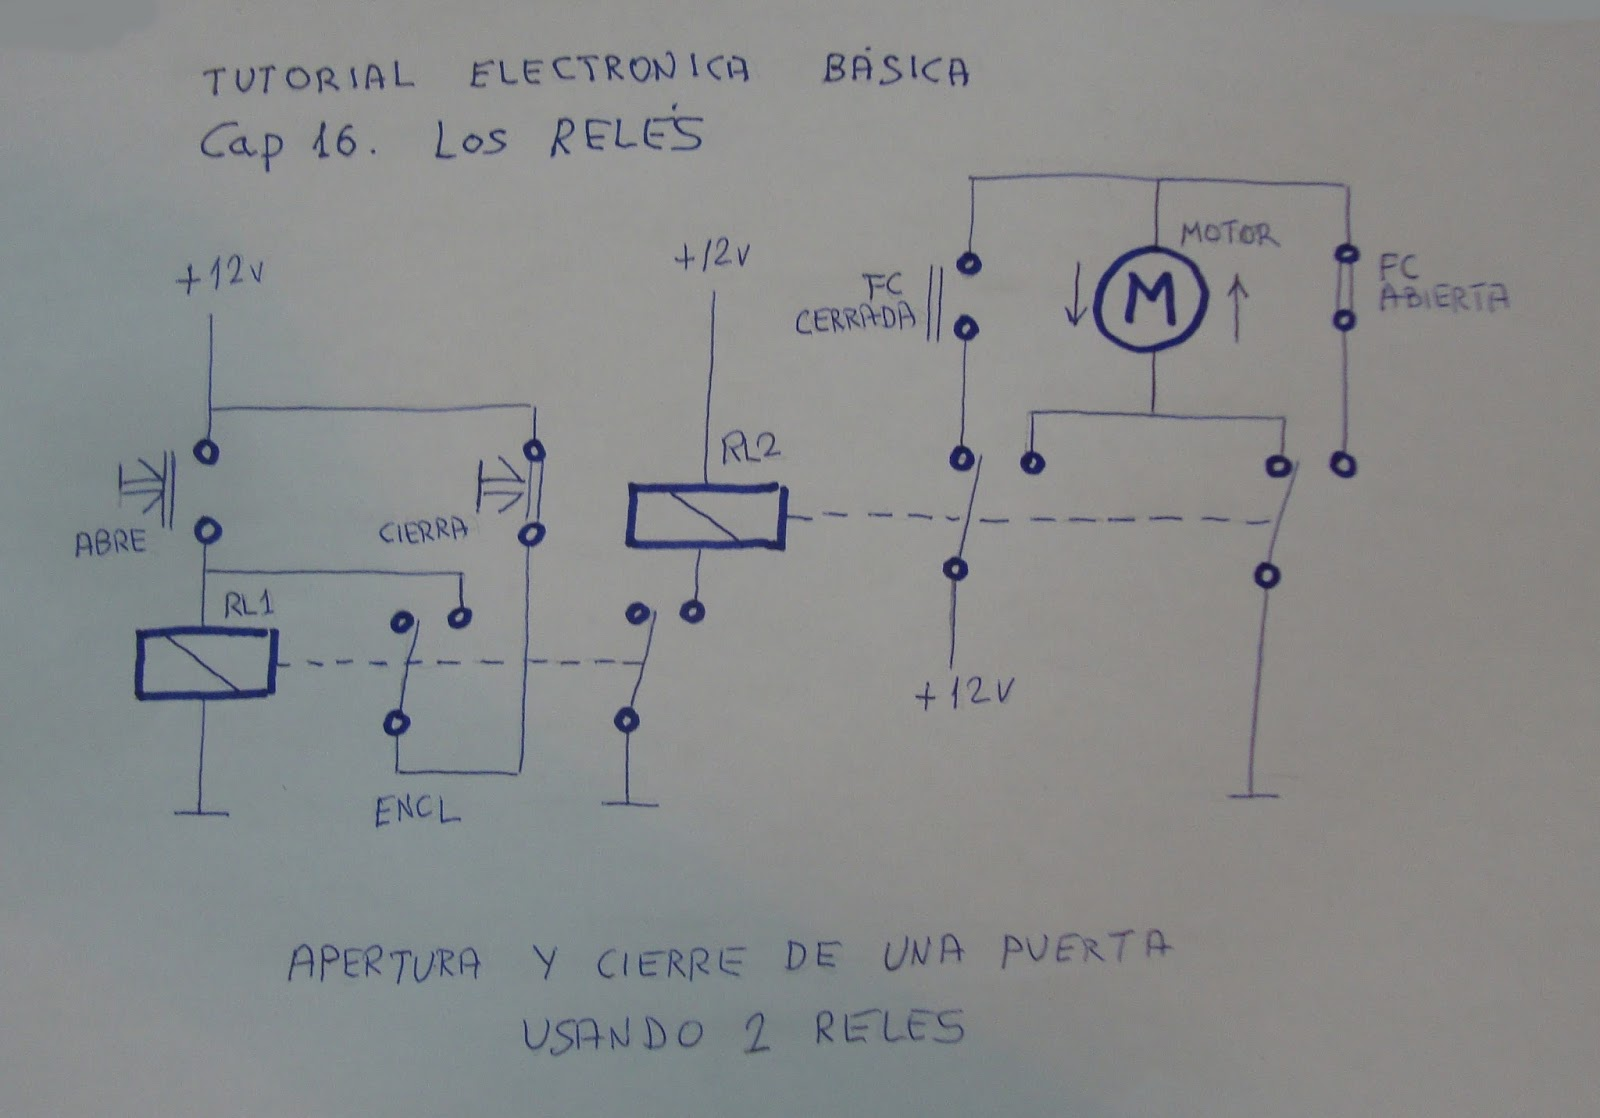 Circuito Electrico Basico : Diagrama electrico basico de refrigeracion auto wiring diagram